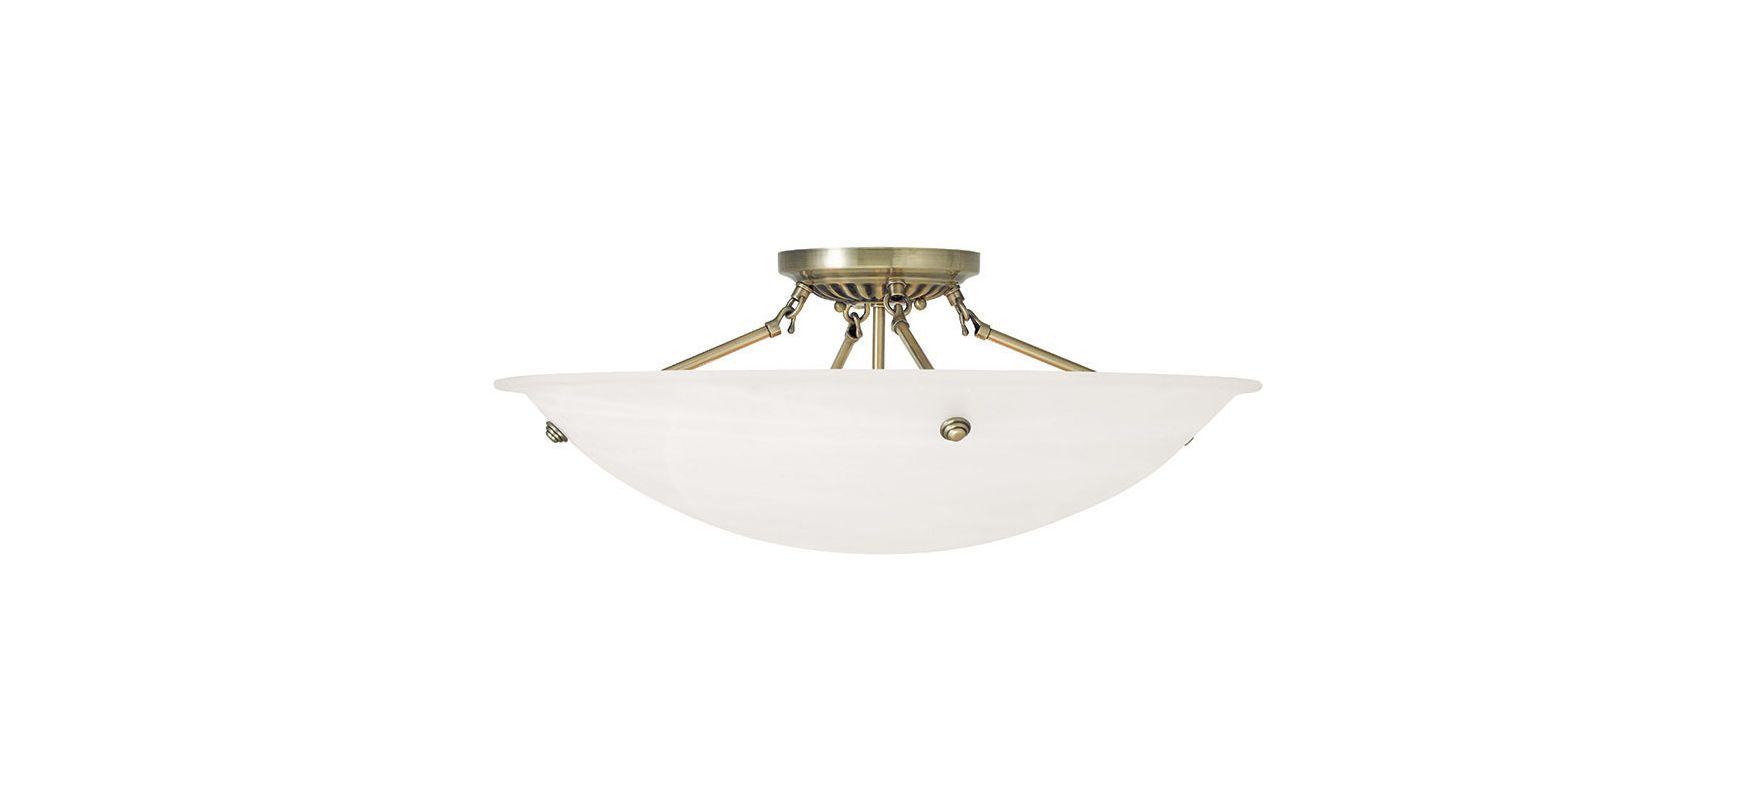 Livex Lighting 4275 Oasis 4 Light Semi-Flush Ceiling Fixture Antique Sale $249.90 ITEM: bci2545524 ID#:4275-01 UPC: 847284043800 :